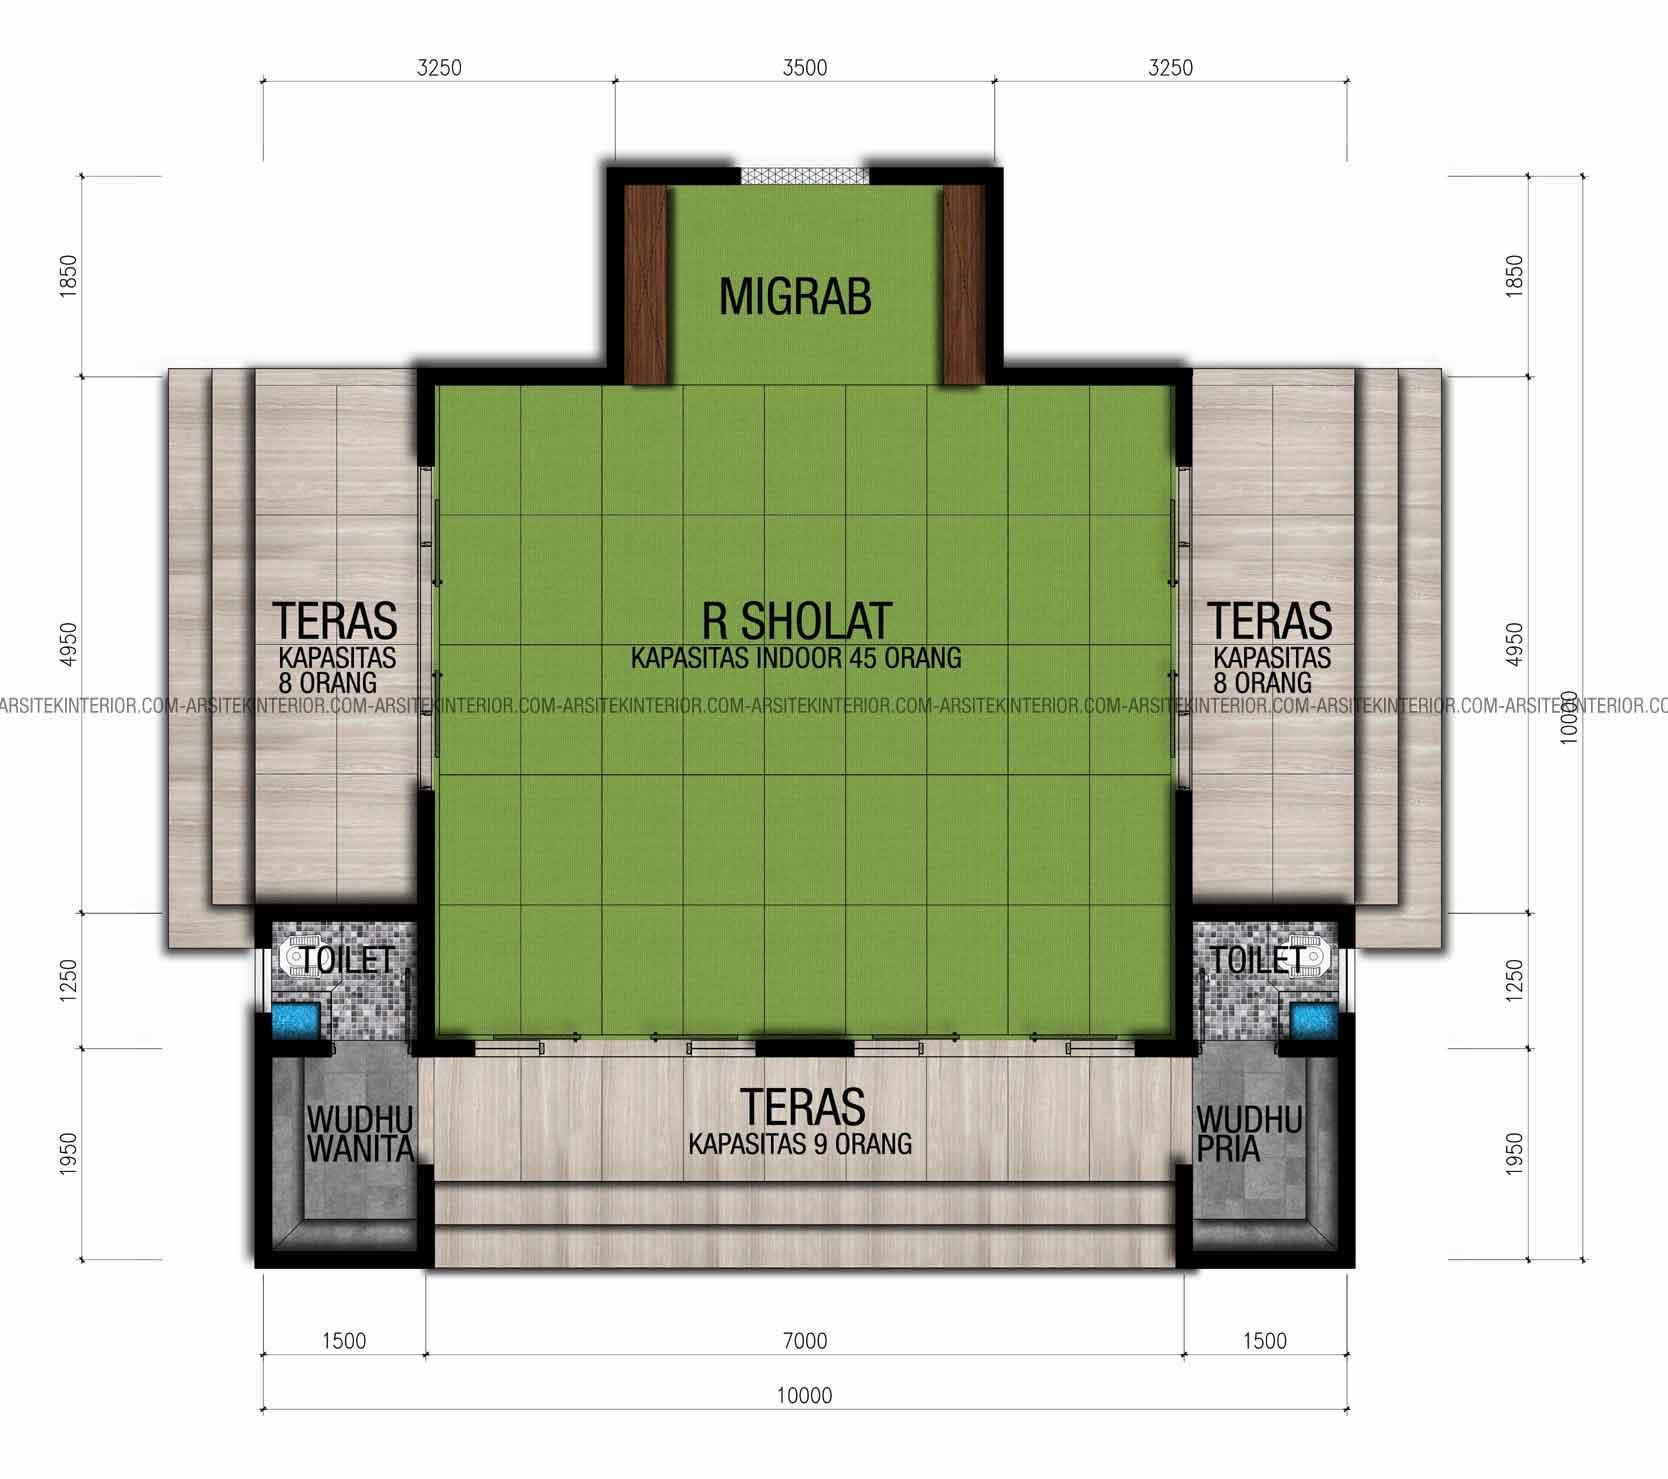 Desain Masjid Persegi Panjang Rumah Joglo Limasan Work